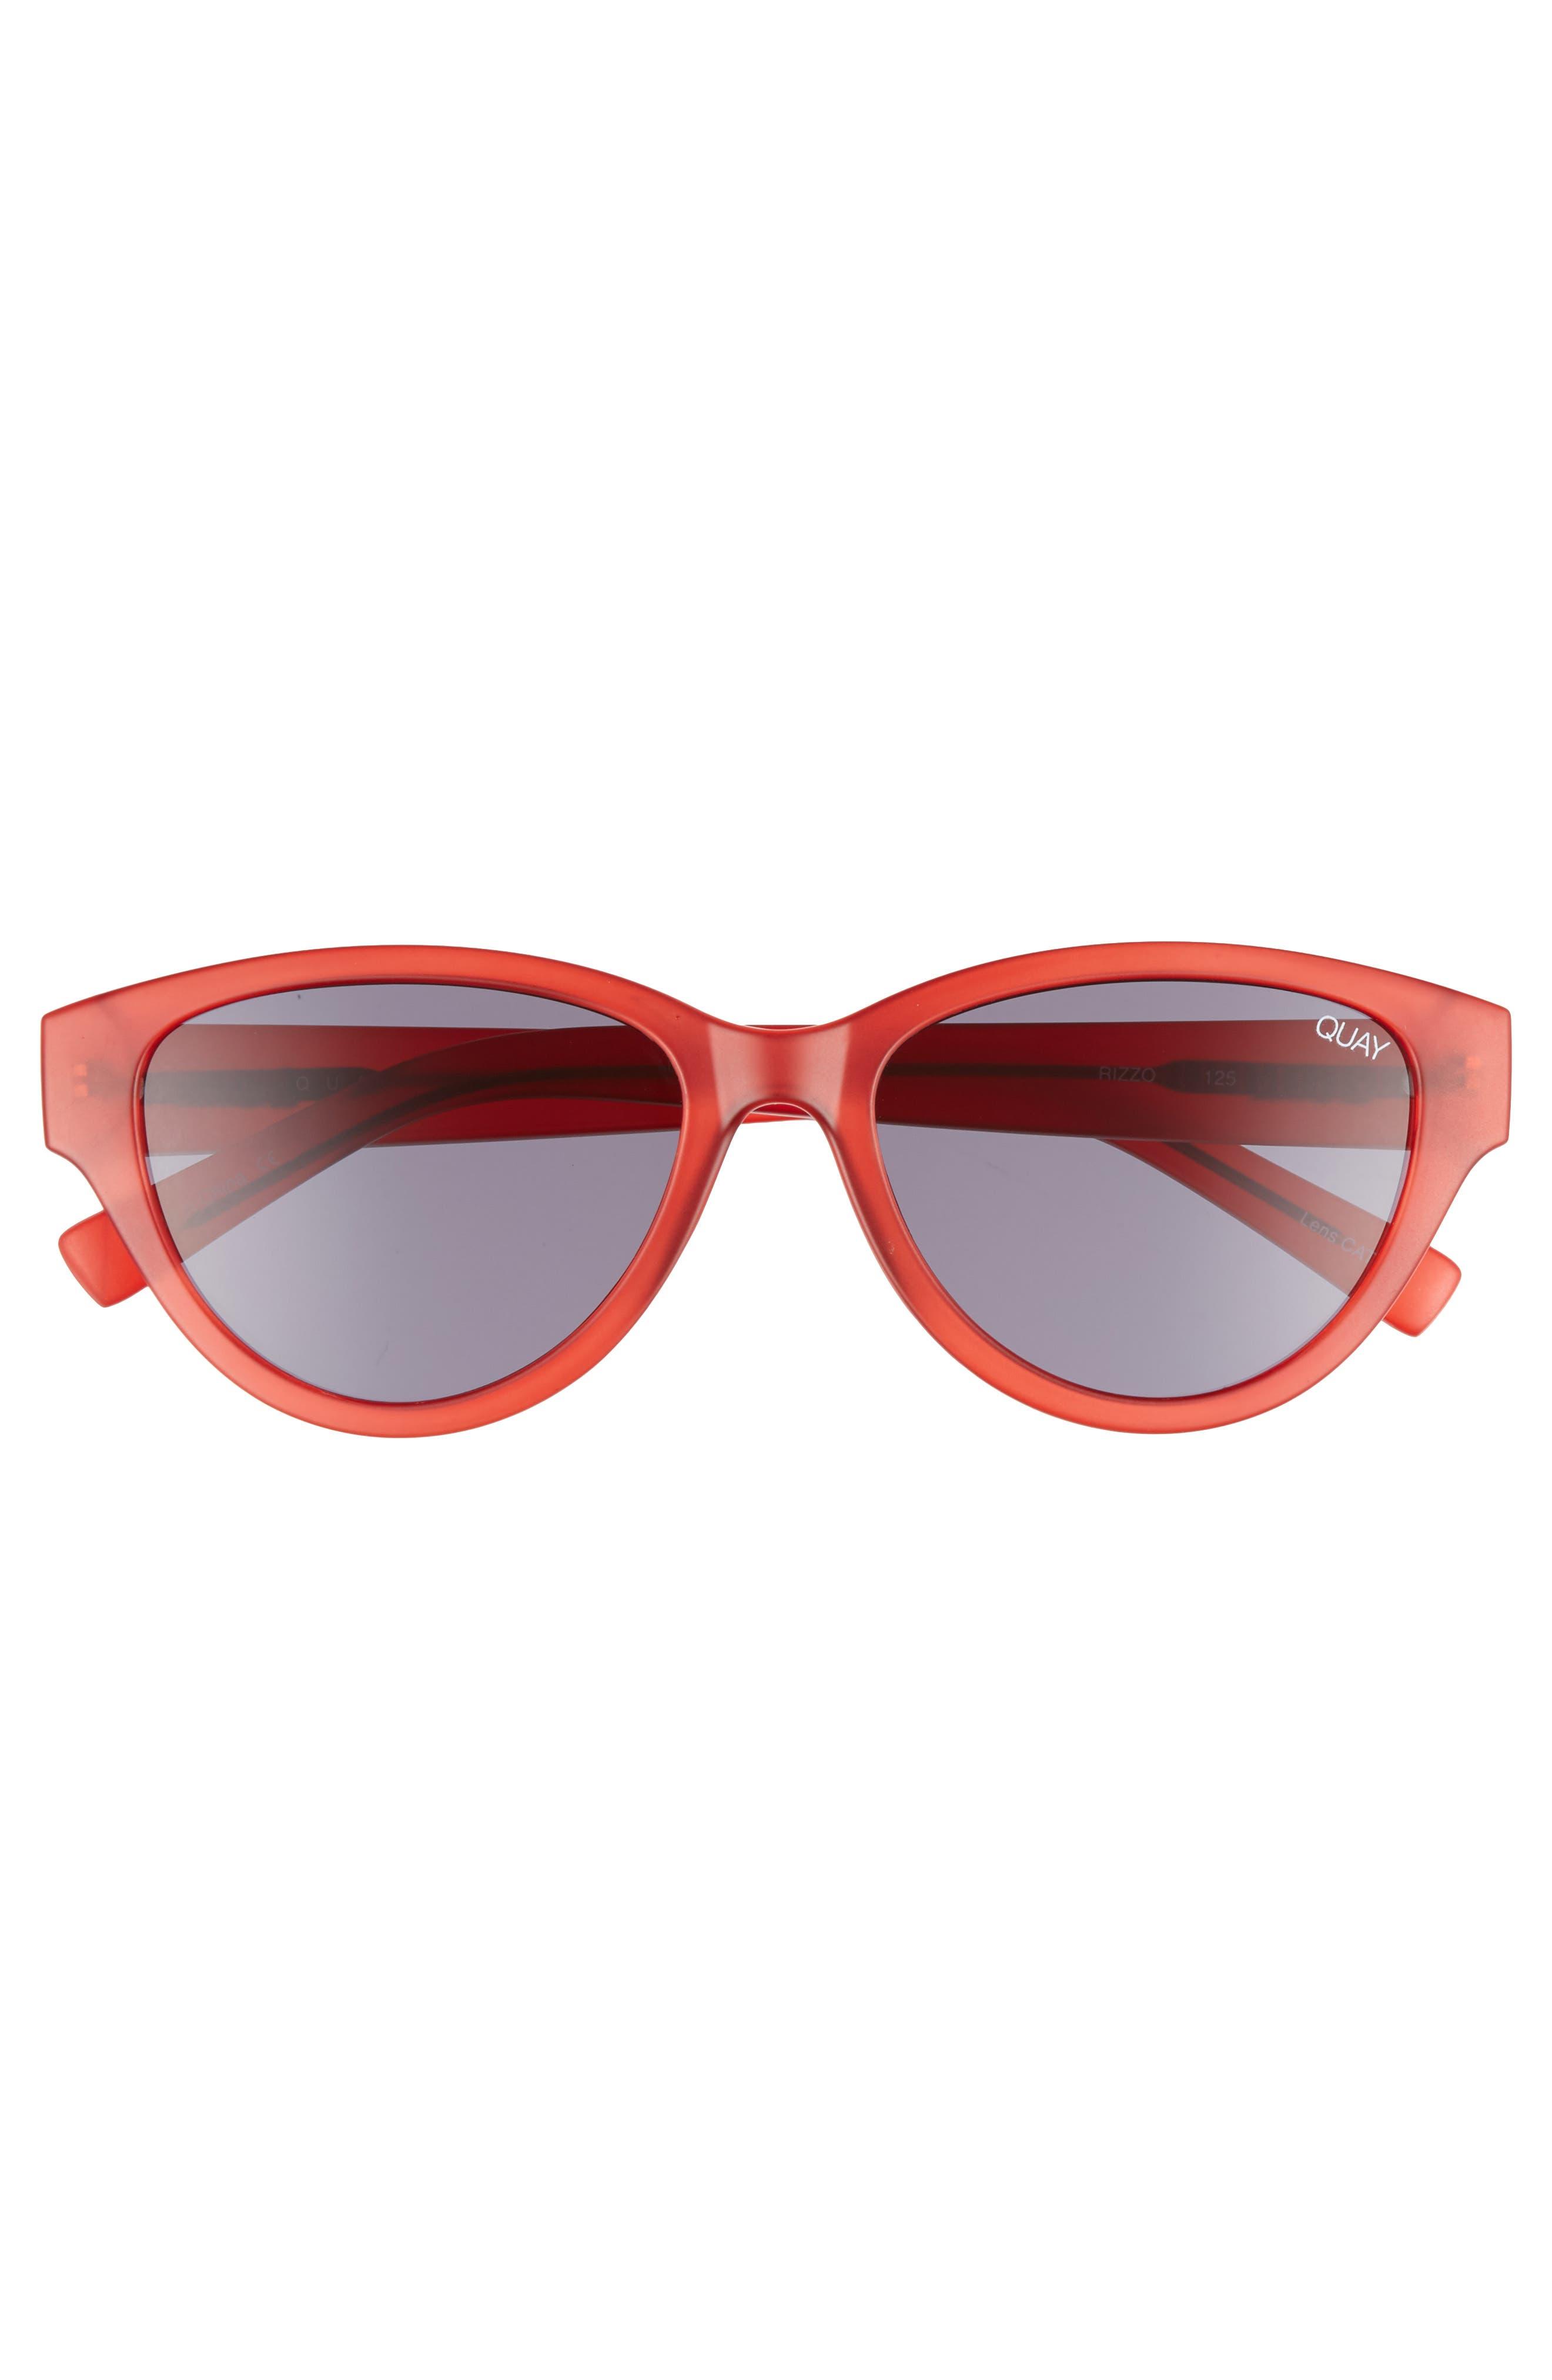 Rizzo 55mm Cat Eye Sunglasses,                             Alternate thumbnail 4, color,                             Red/ Smoke